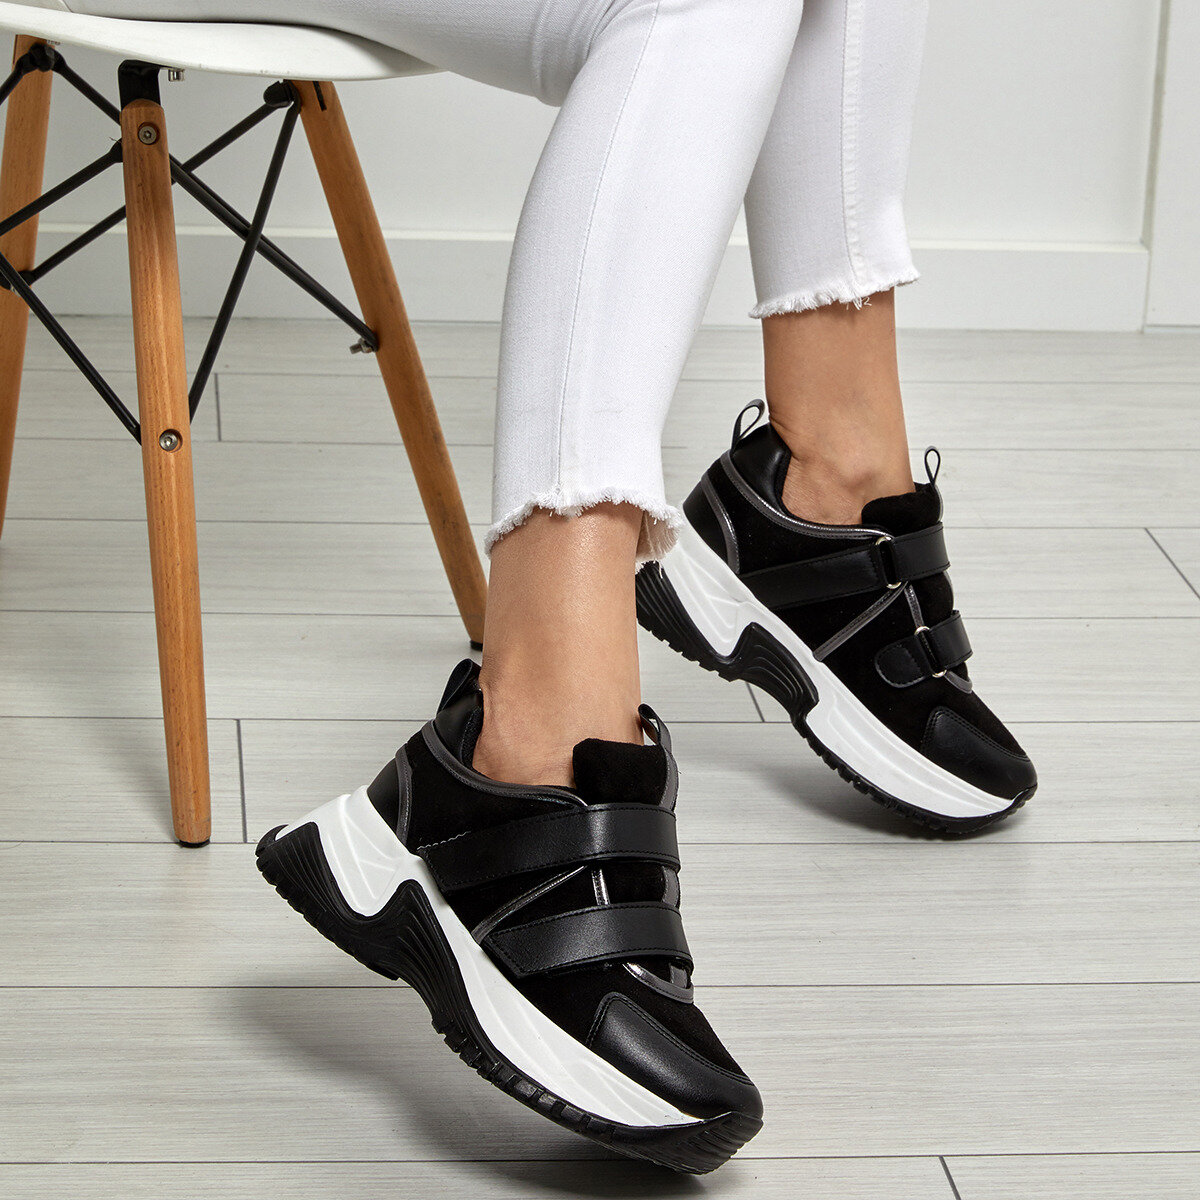 FLO Black Women Sneaker Shoes Women Platform Sneakers Lace-up Casual Shoes Designer Old Dad Female Fashion Sneakers BUTIGO 19SF-2057